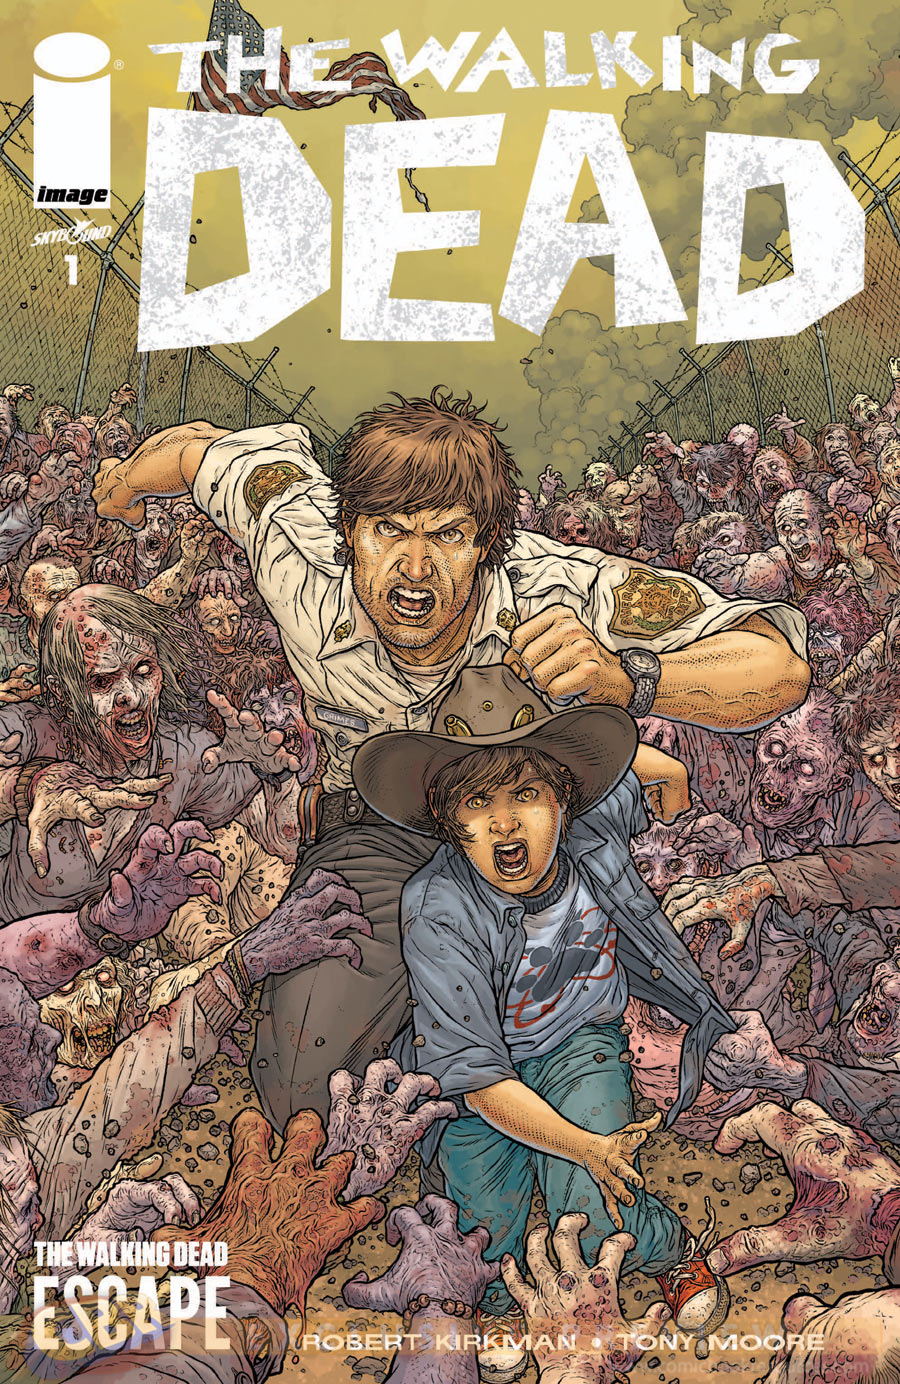 The-Walking-Dead-1-Escape-2014